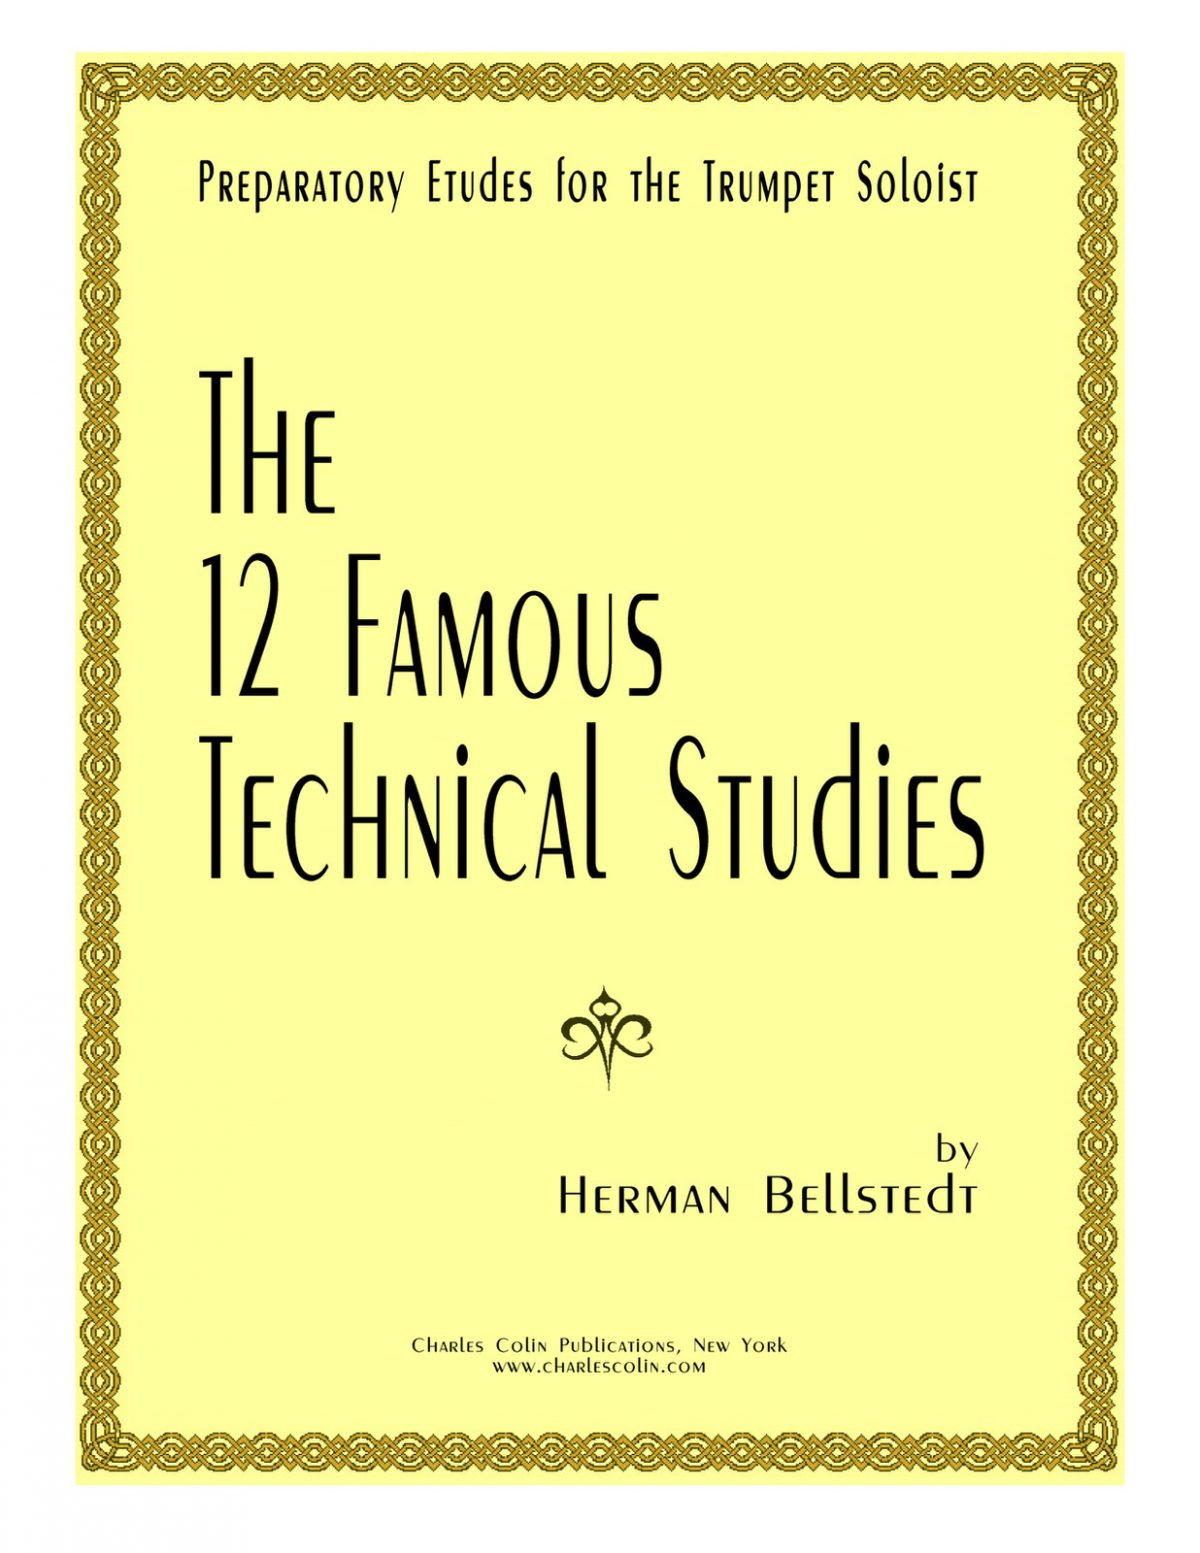 (clean) Bellstedt, Twelve Famous Technical Studies Letter